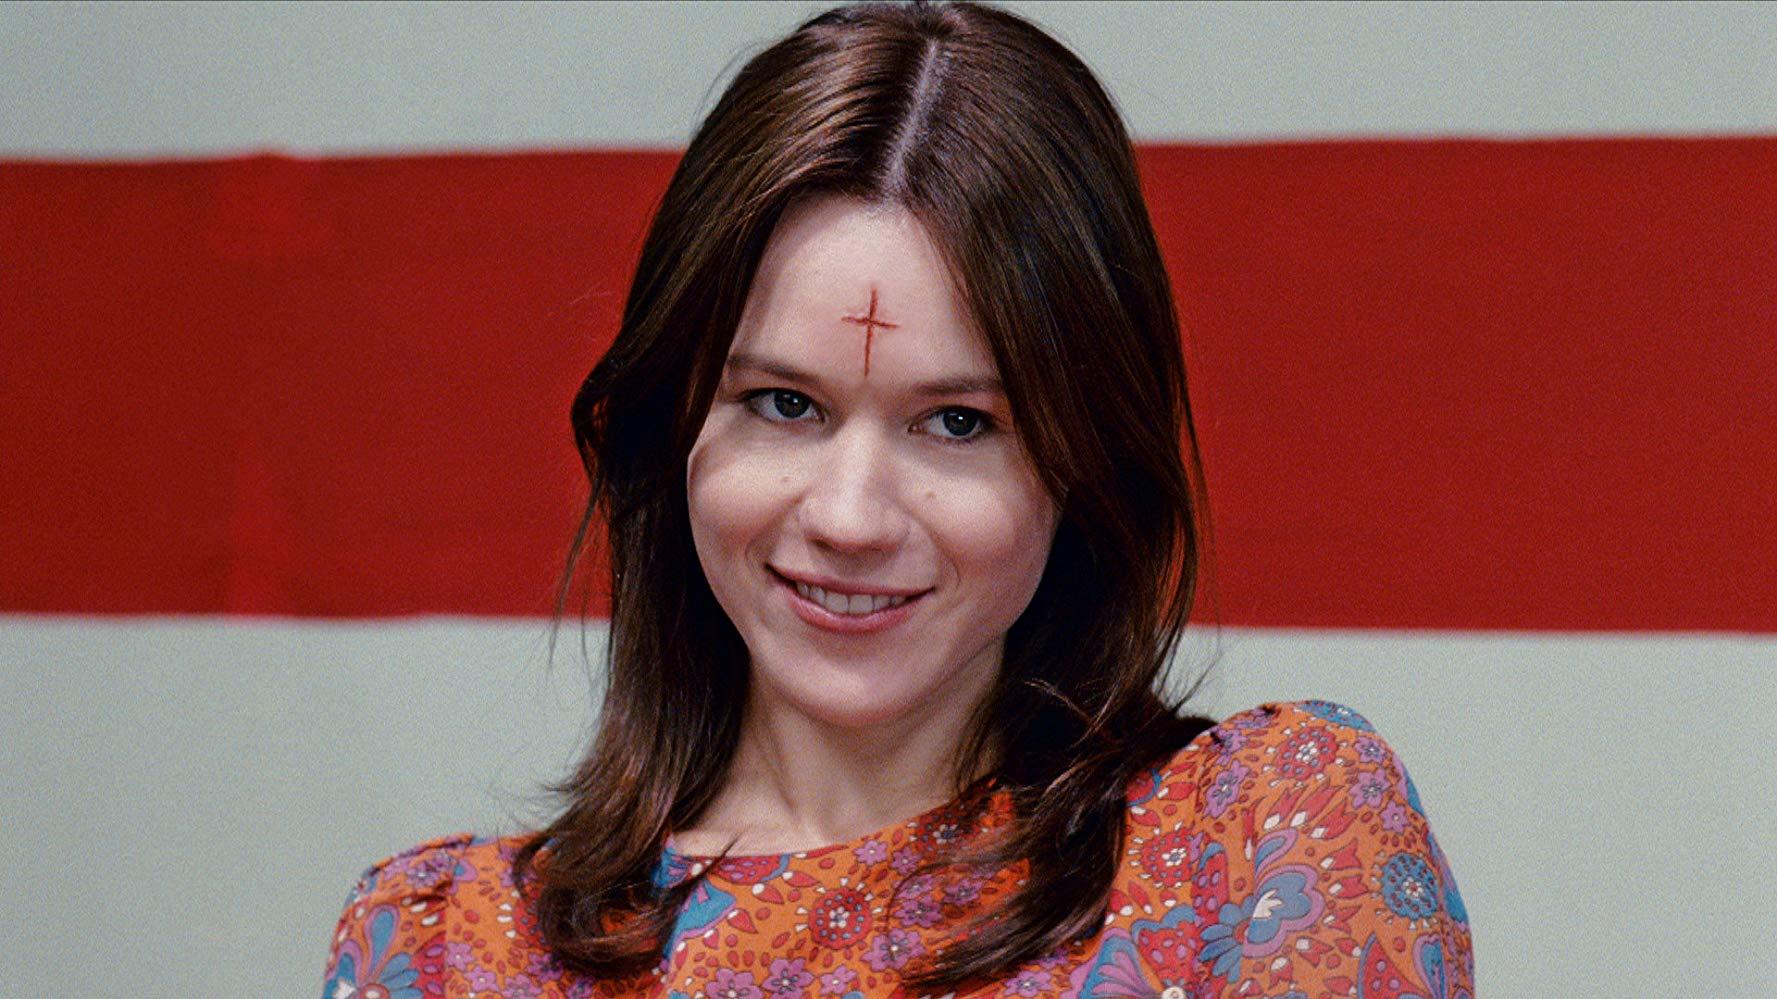 Kristen Hager as Leslie Van Houten, one of the Manson Girls in Leslie, My Name is Evil (2009)